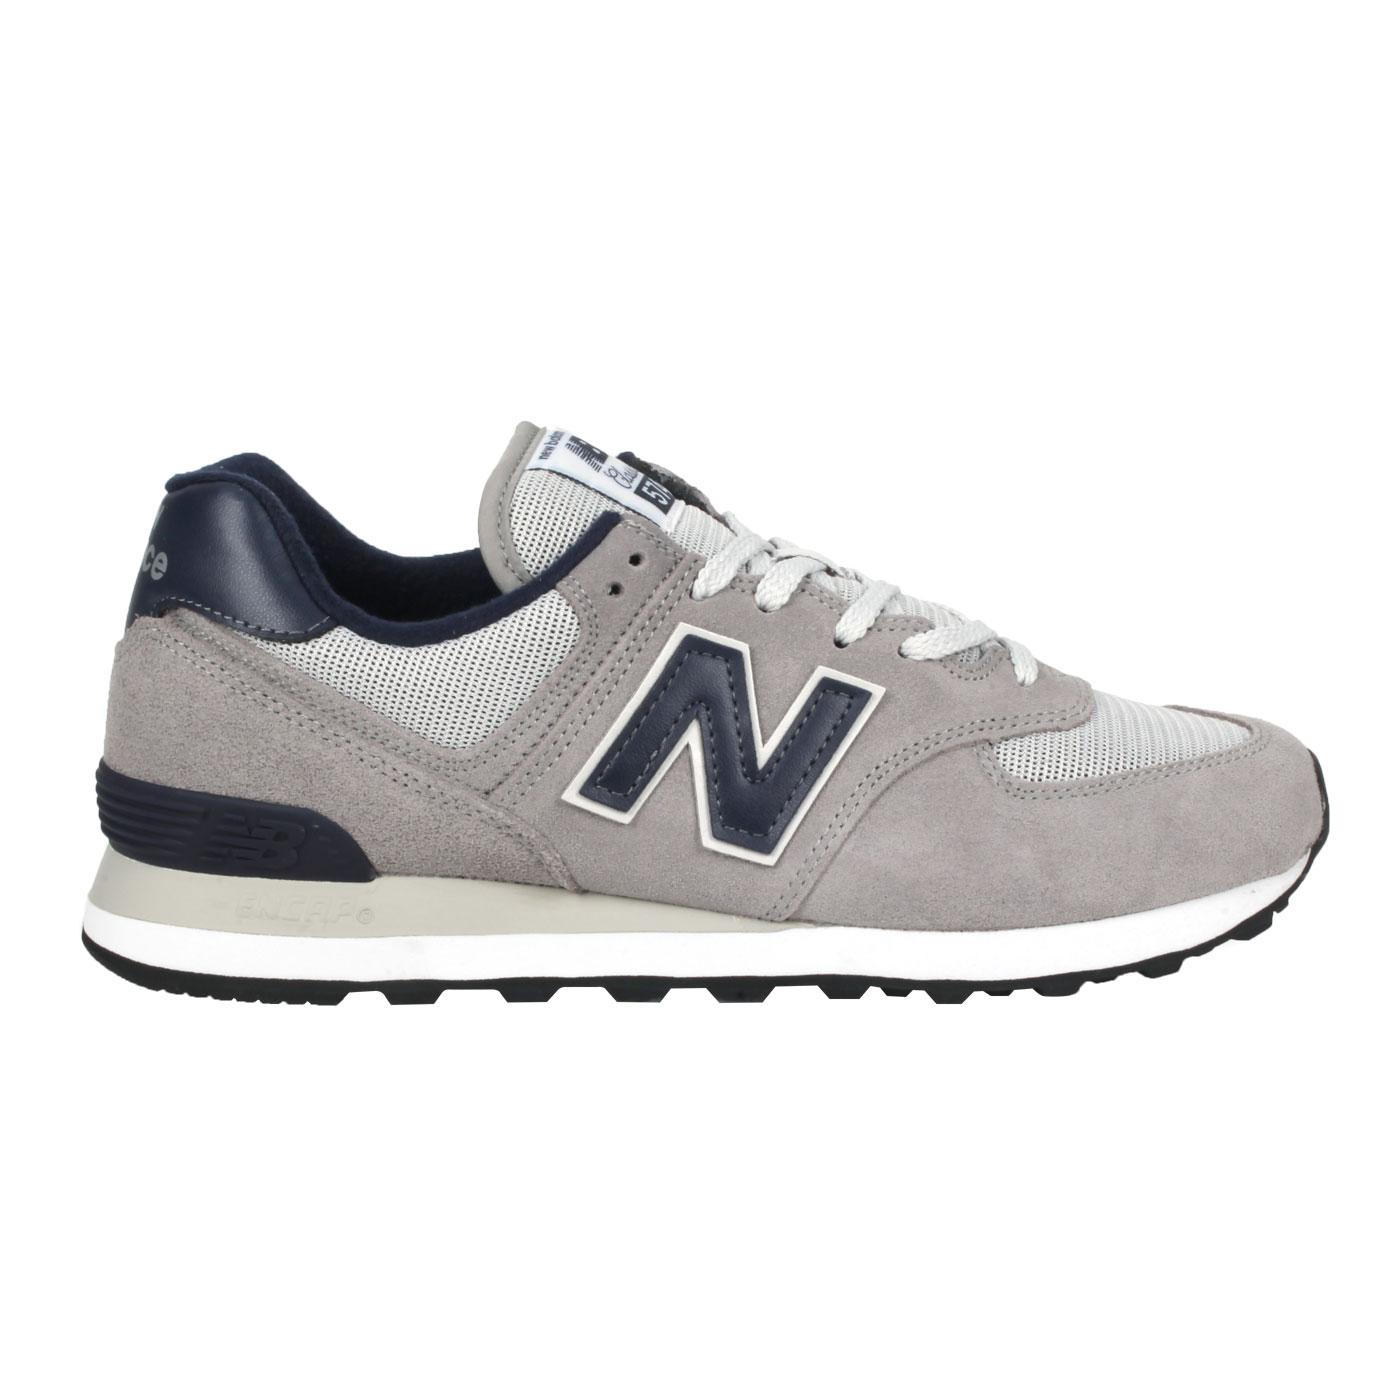 NEW BALANCE 男款休閒運動鞋 ML574BE2 - 灰丈青